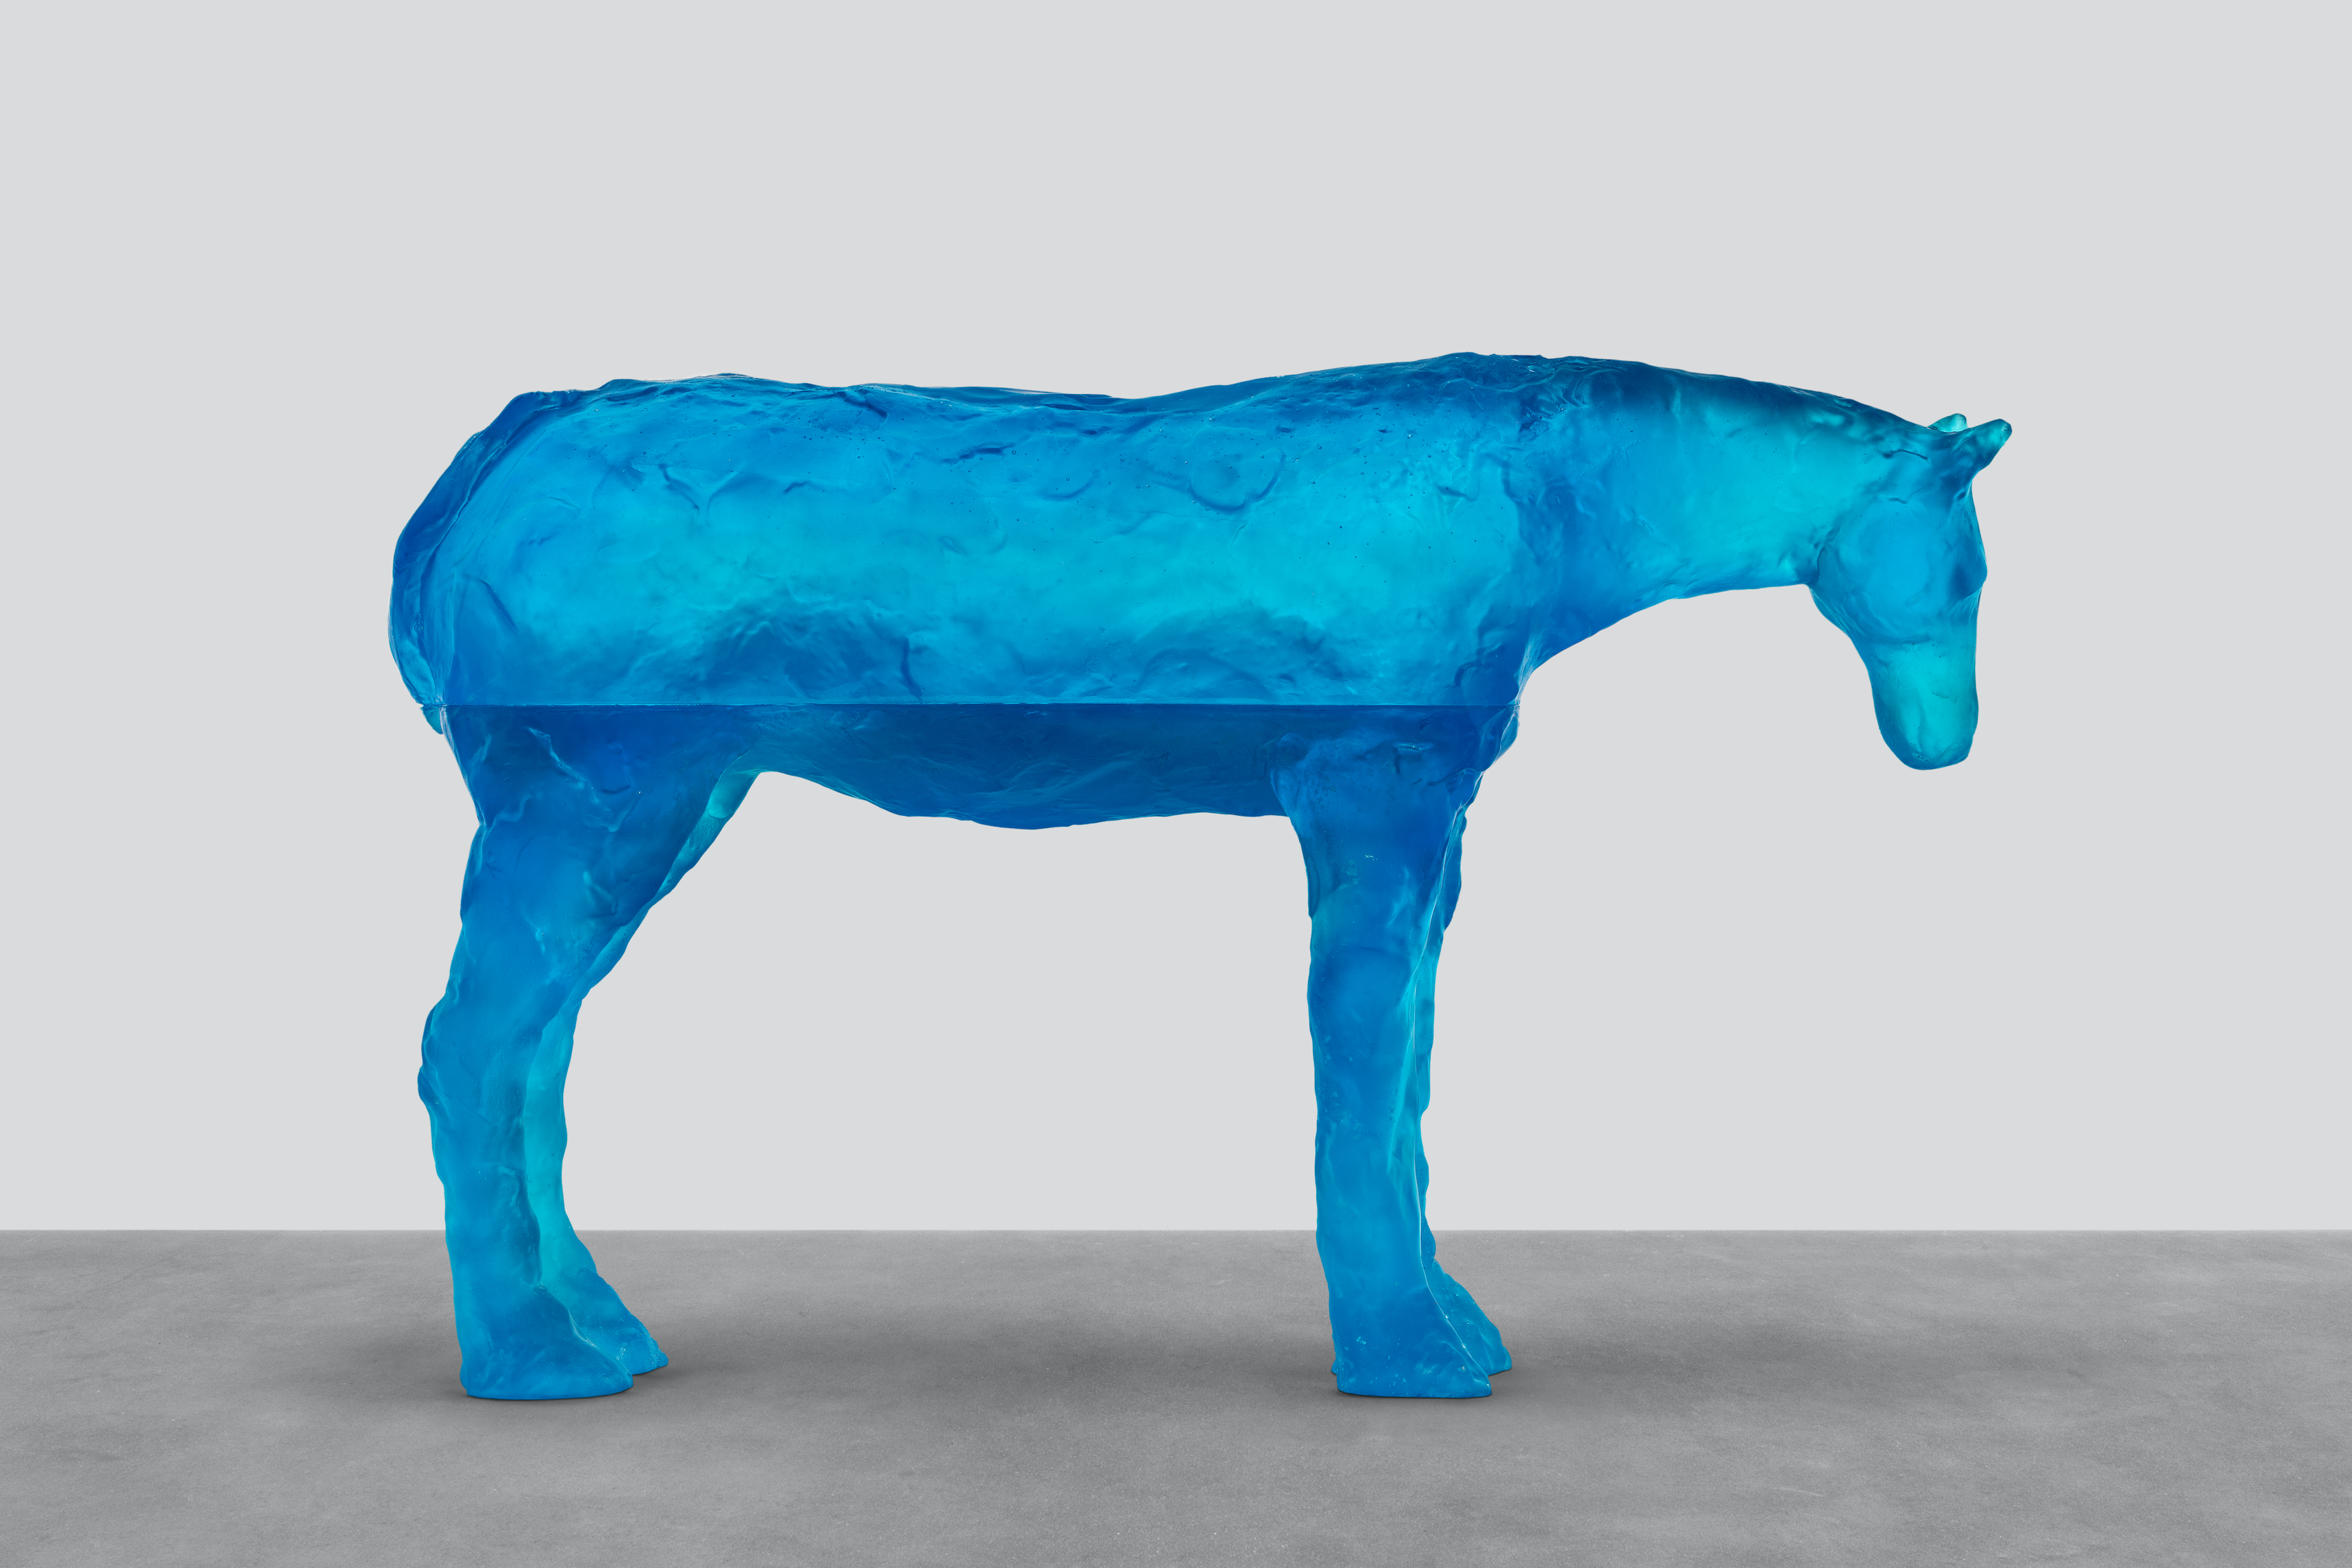 Ugo Rondinone arabian sea, 2021 blue glass 80.2 x 126.5 x 30.4 cm / 31 5⁄8 x 49 3⁄4 x 12 in Credit: © Ugo Rondinone, courtesy Sadie Coles HQ, London. Photo: Eva Herzog